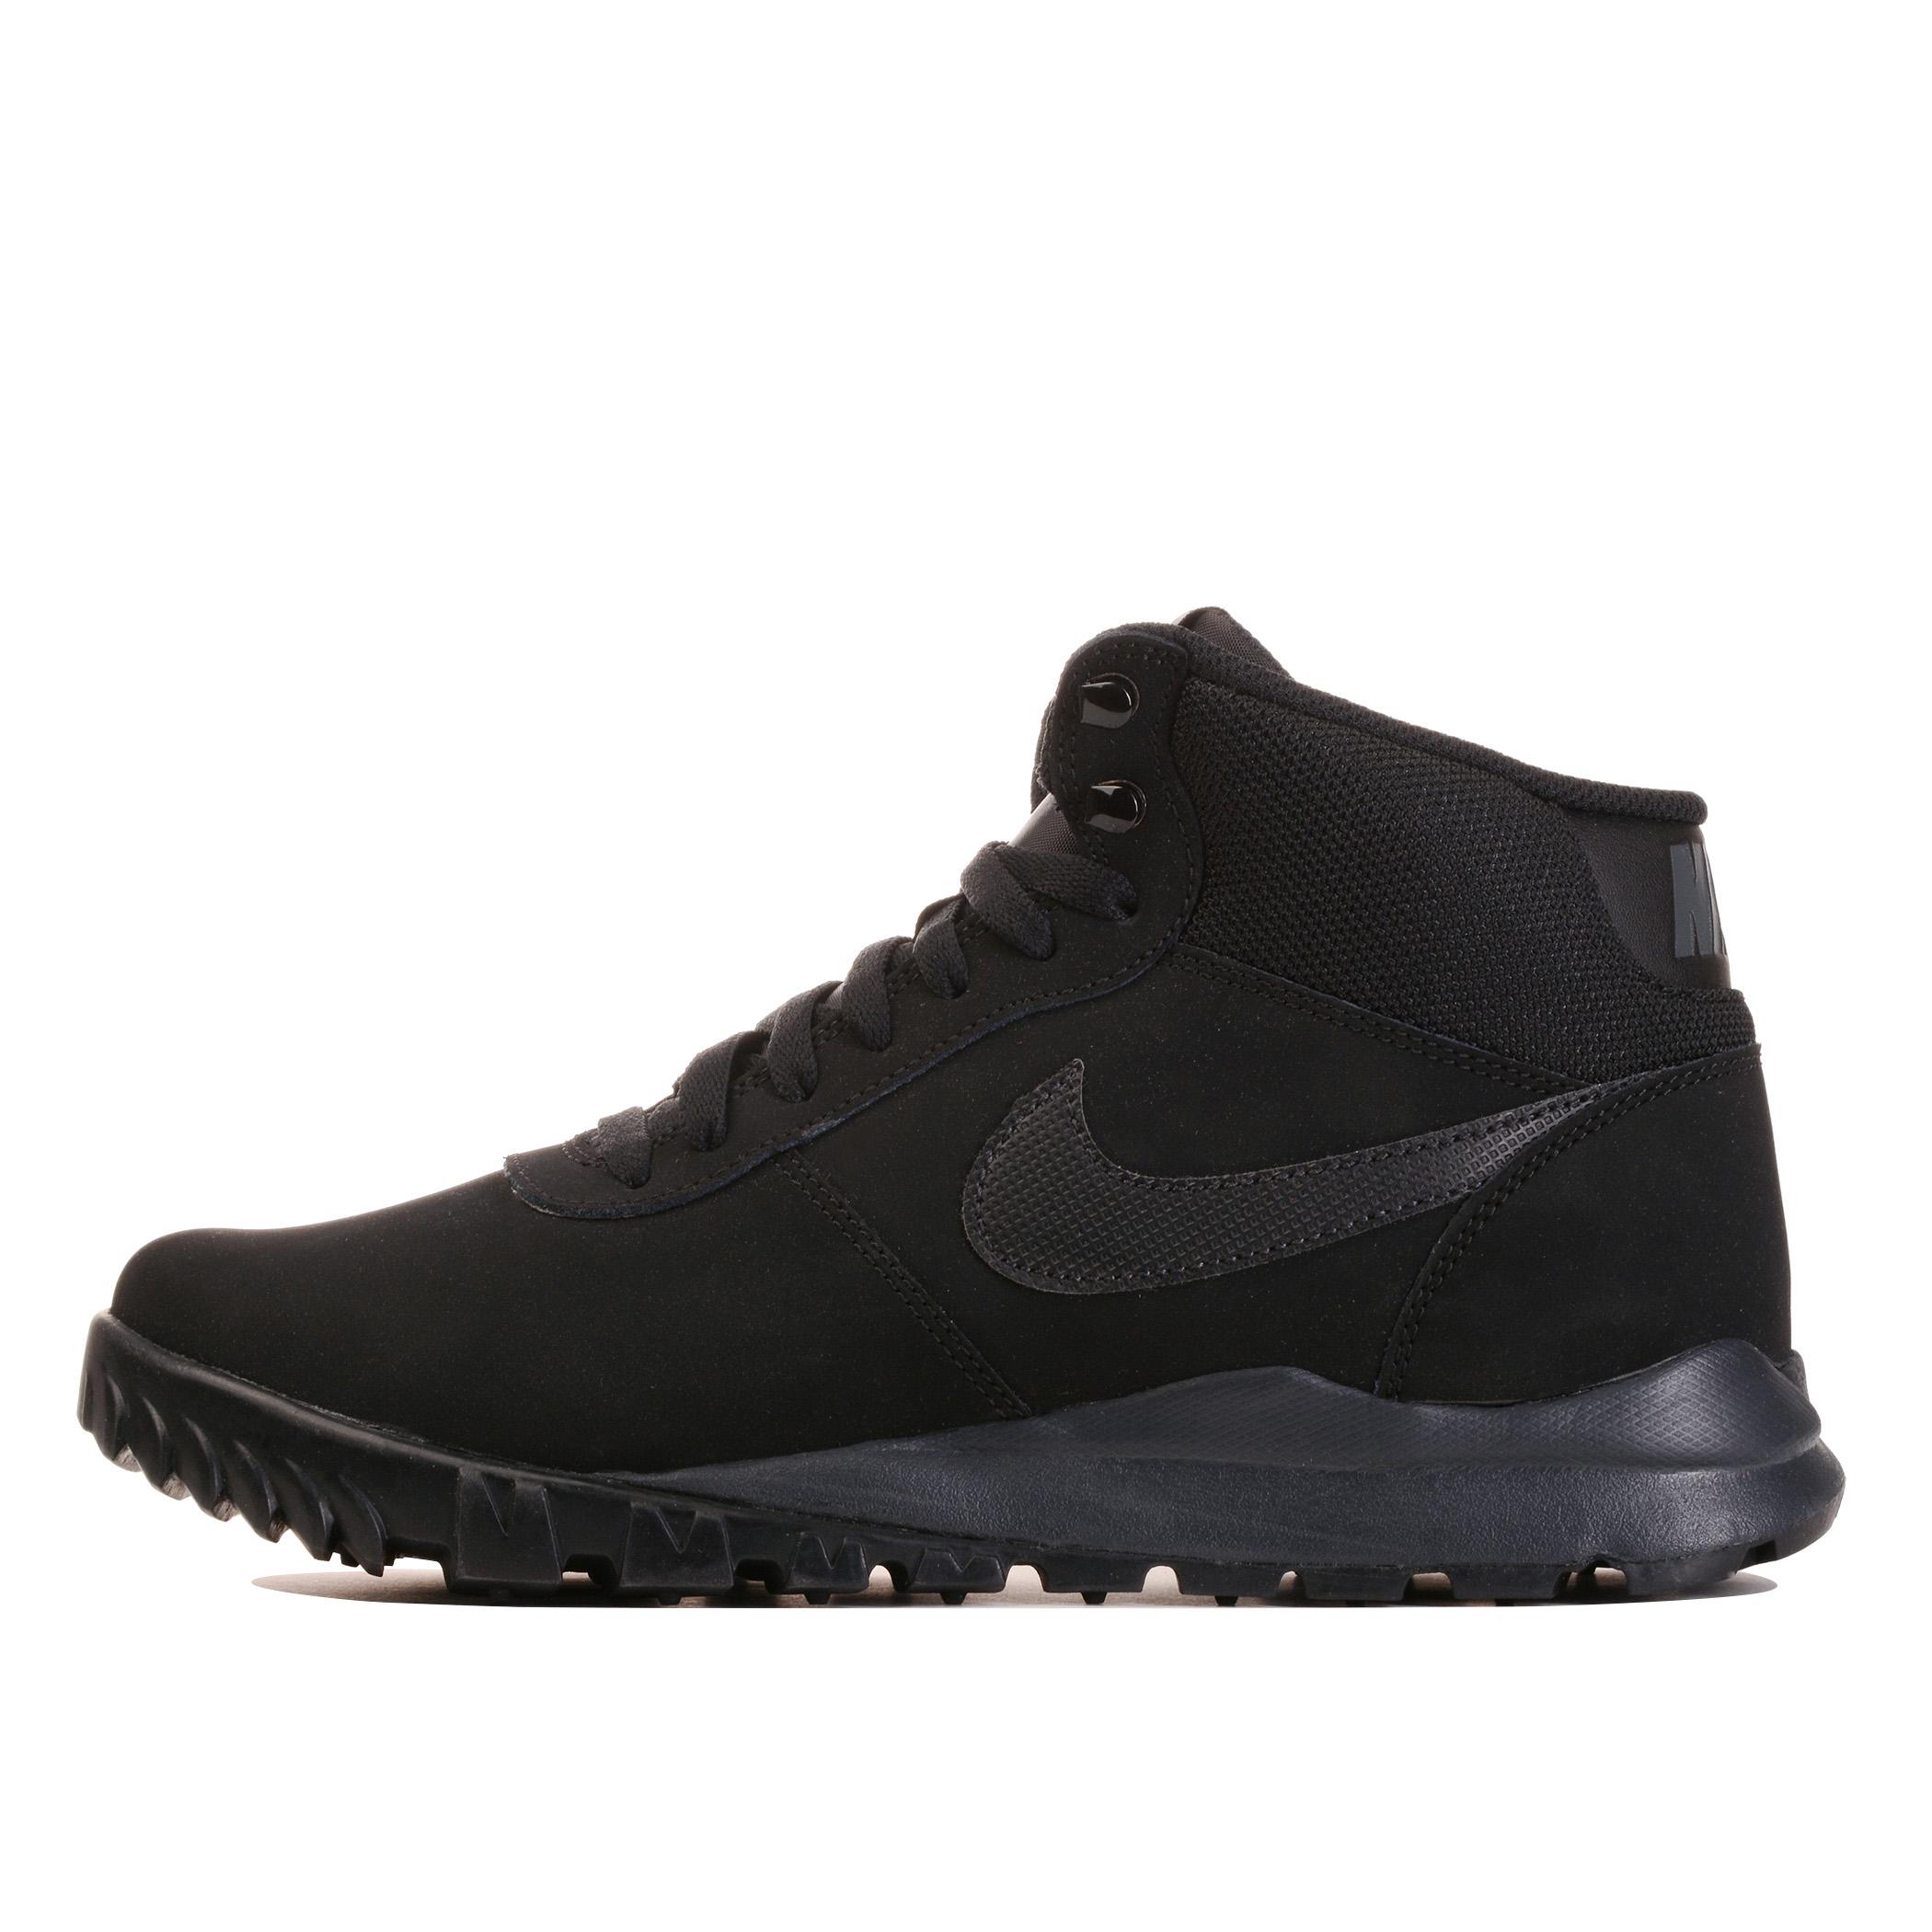 d51c353b Мужские ботинки Nike Hoodland Suede Black/Black-Anthracite - фото 1